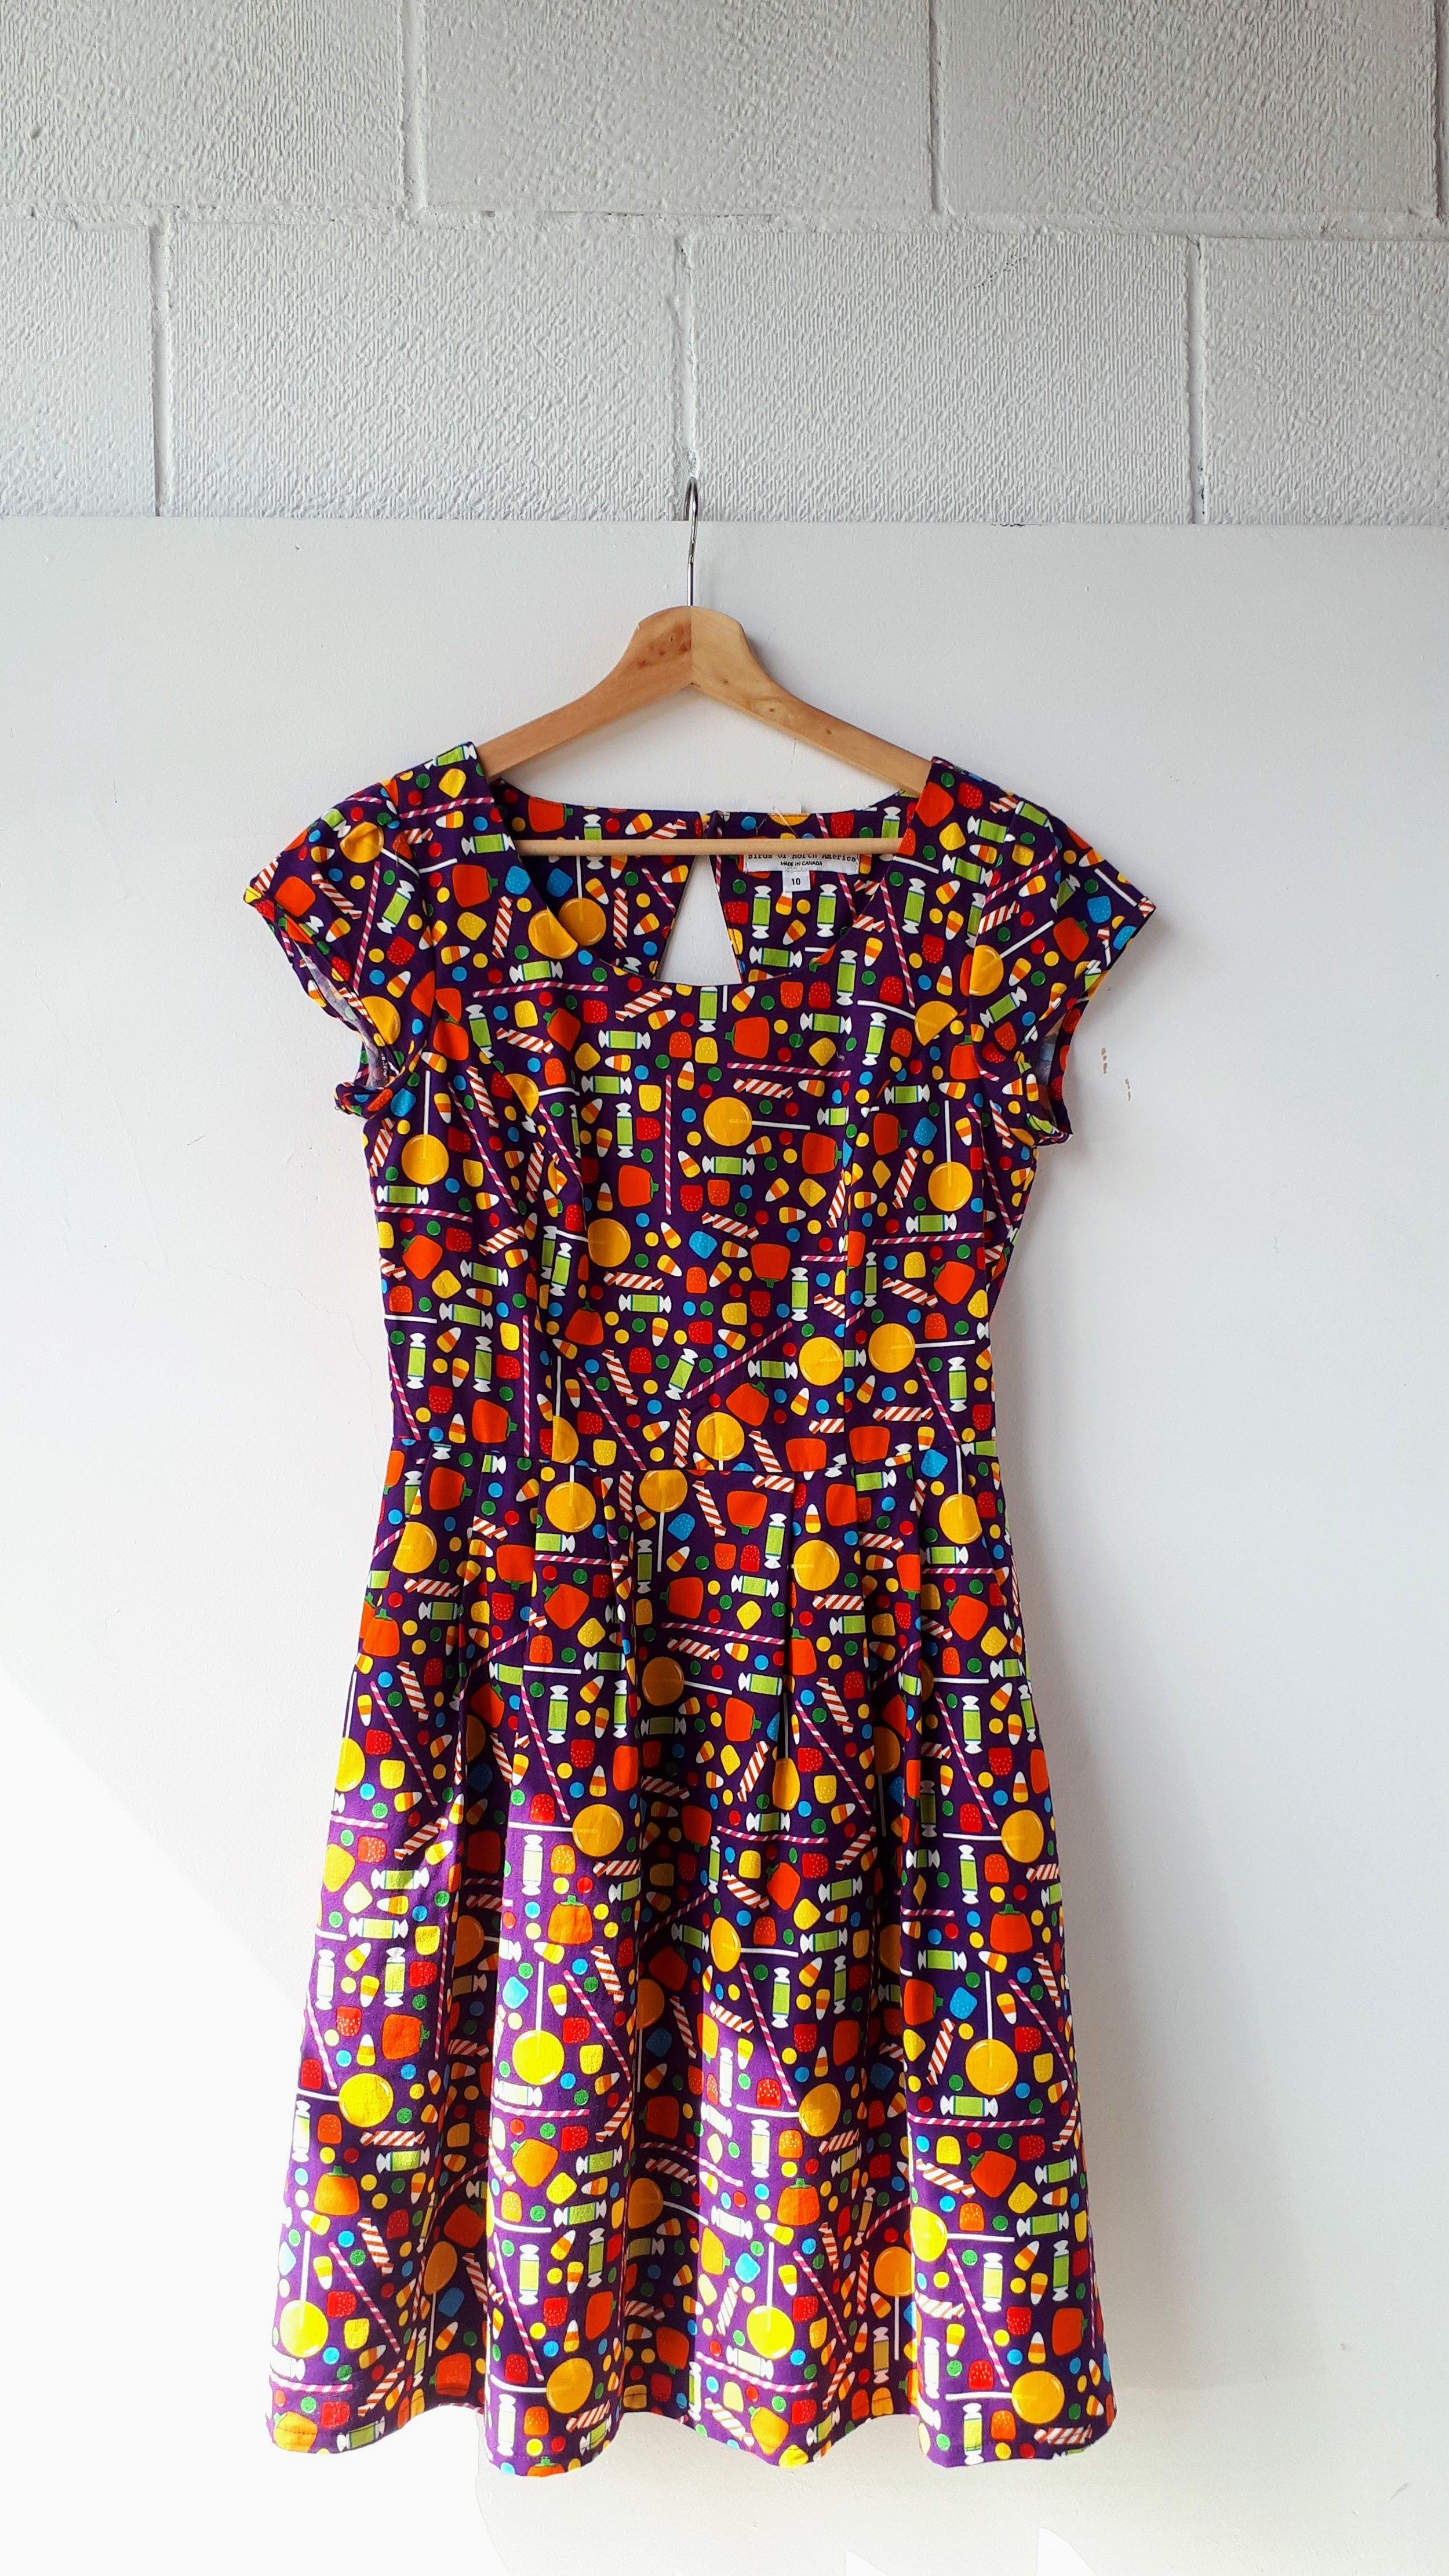 Birds of North America dress; Size 10, $42